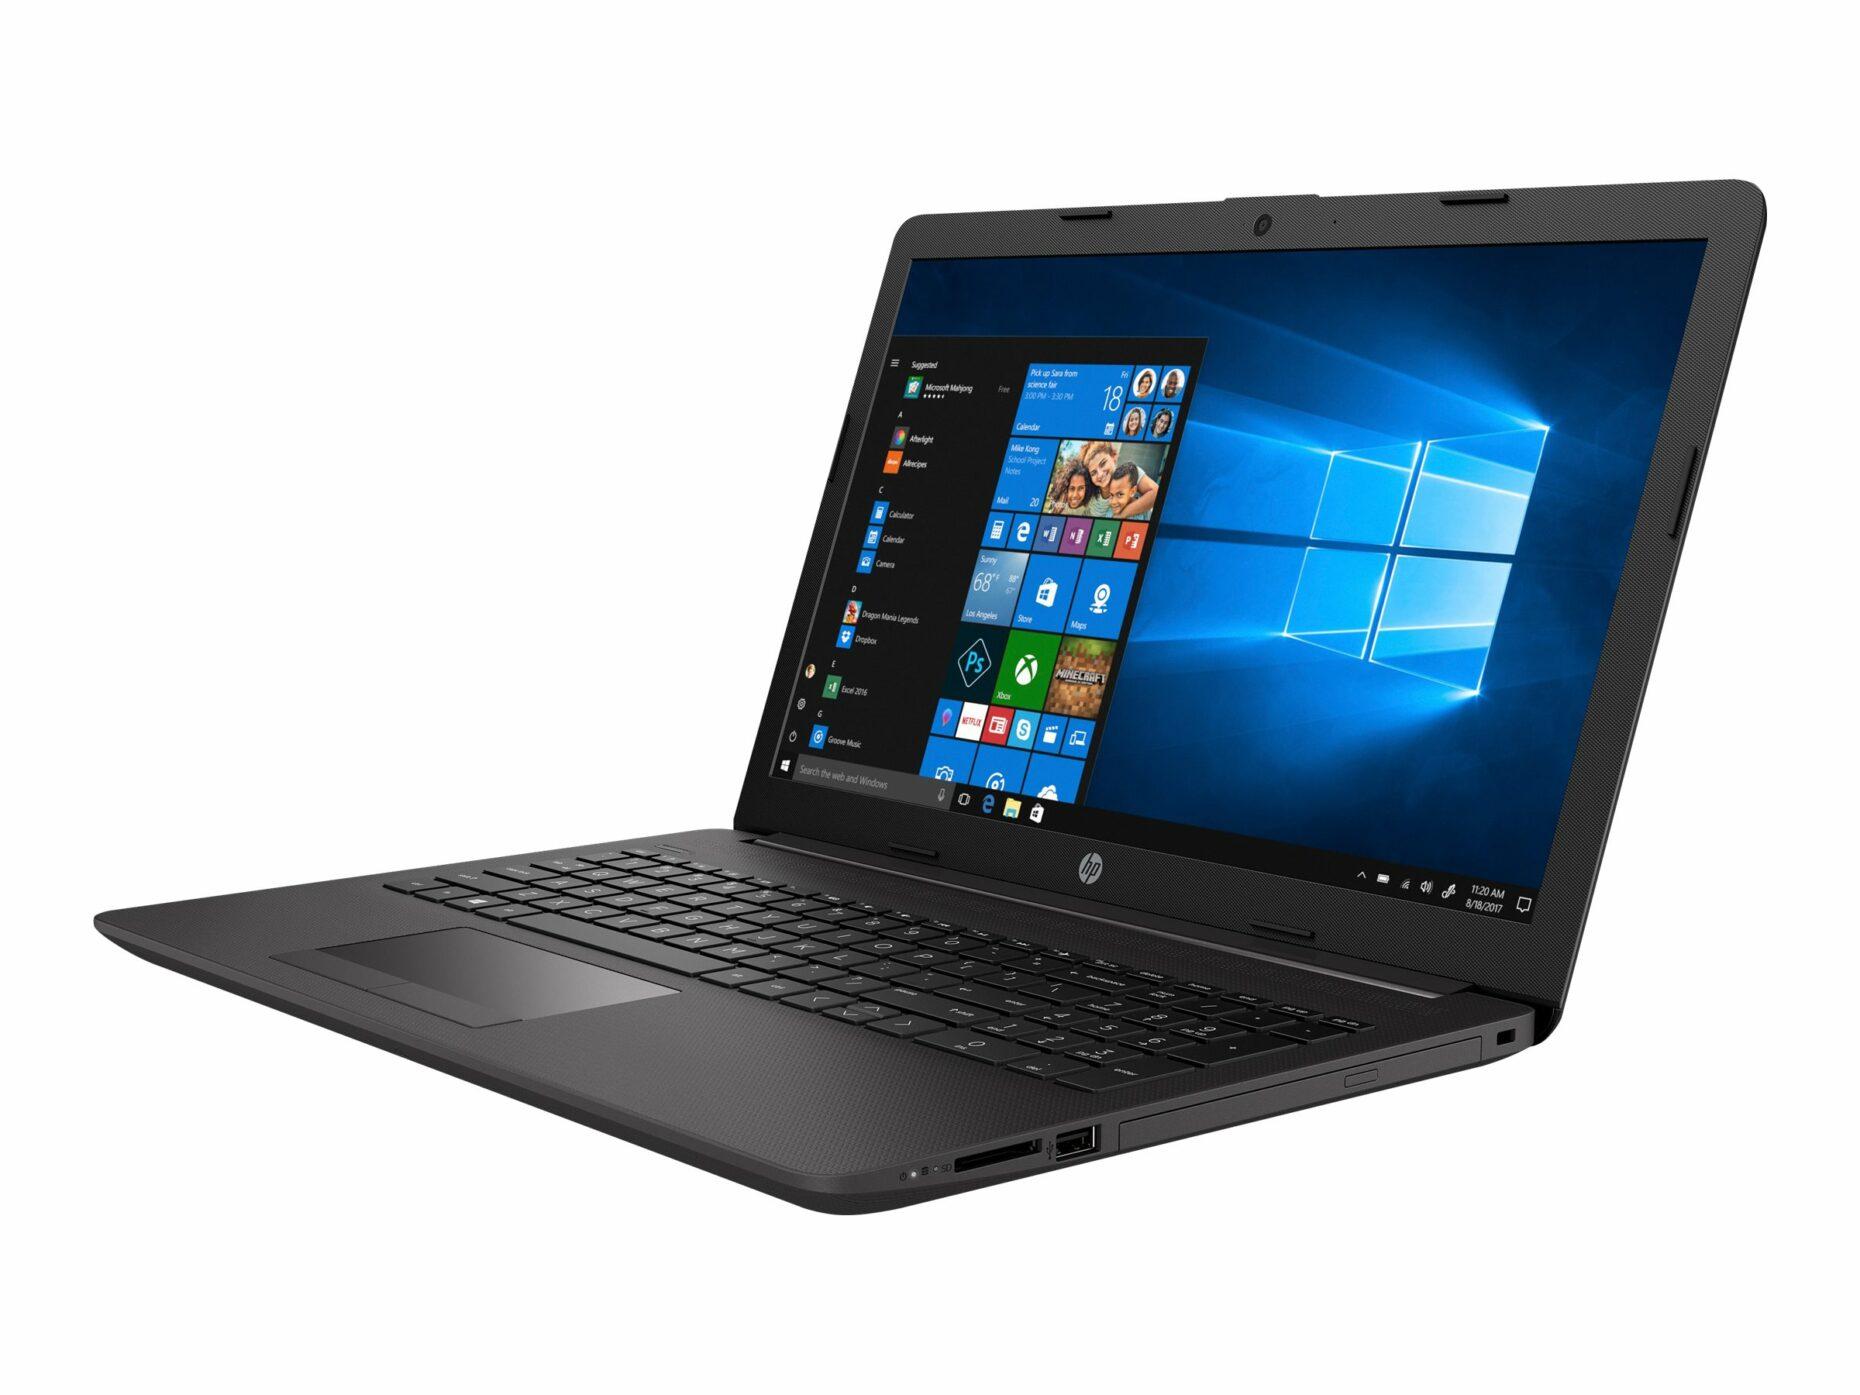 "HP 250 G7 - Core i3 1005G1 - 8 GB RAM - 256 GB SSD - 15.6"" (Full HD) - UHD Graphics - Notebook"